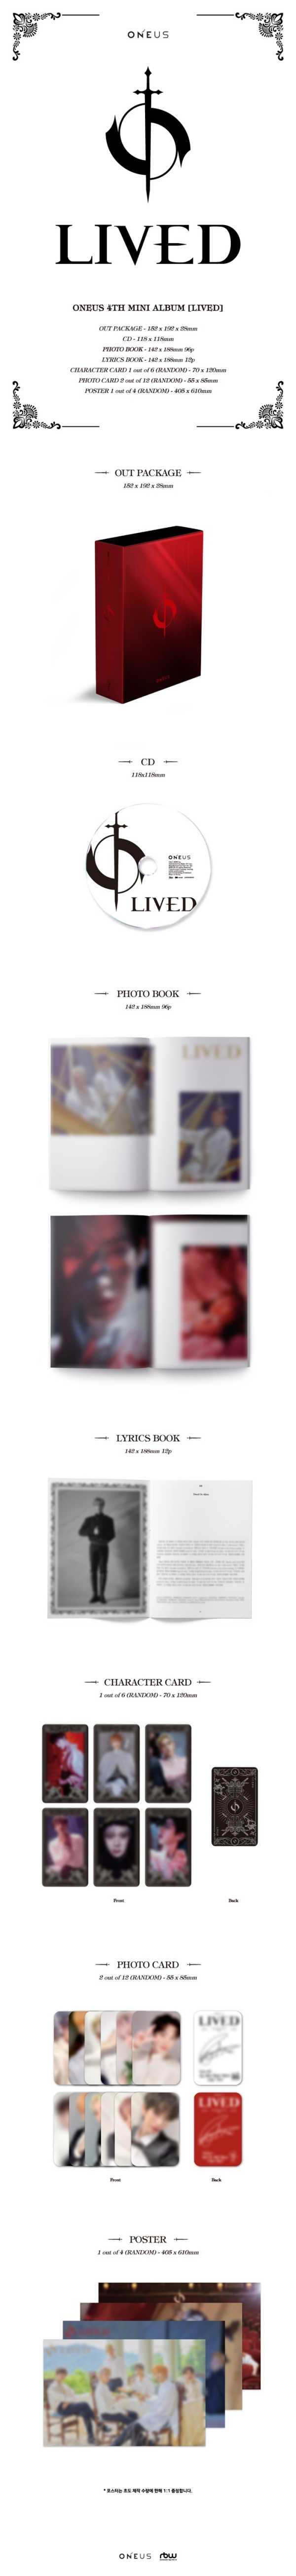 ONEUS、韓国4枚目のミニアルバム『LIVED』